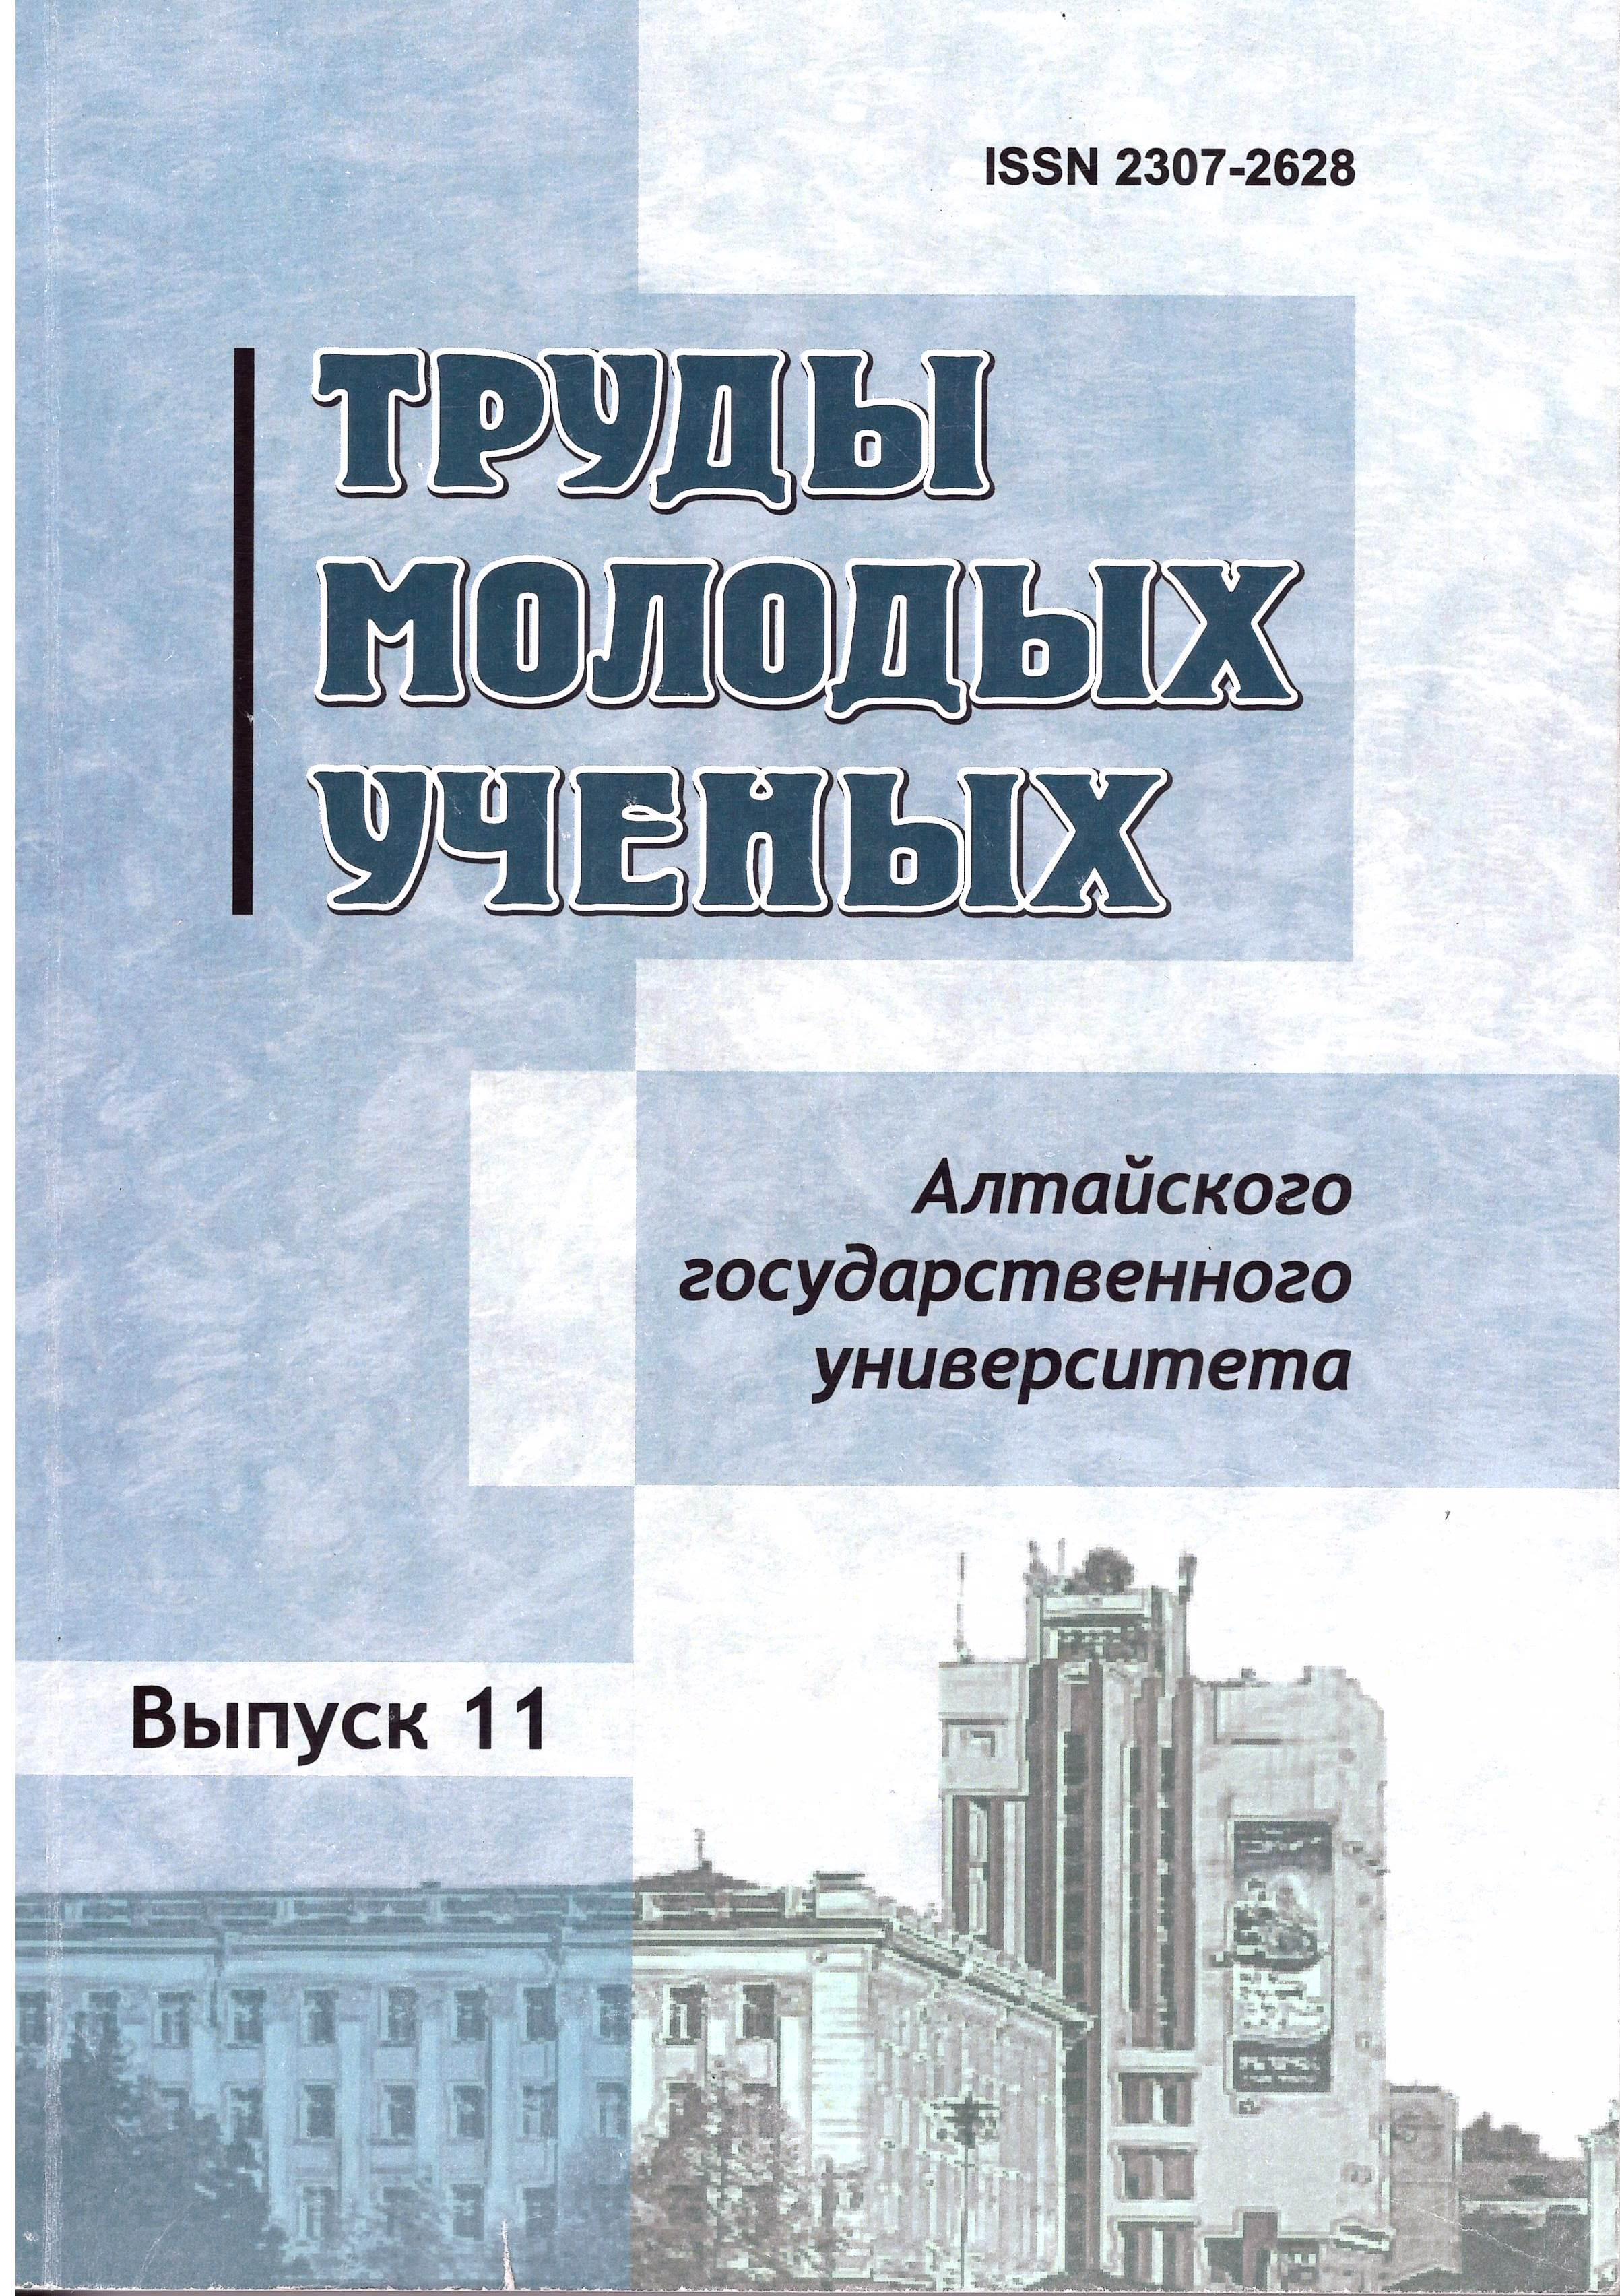 Труды молодых ученых выпуск 11